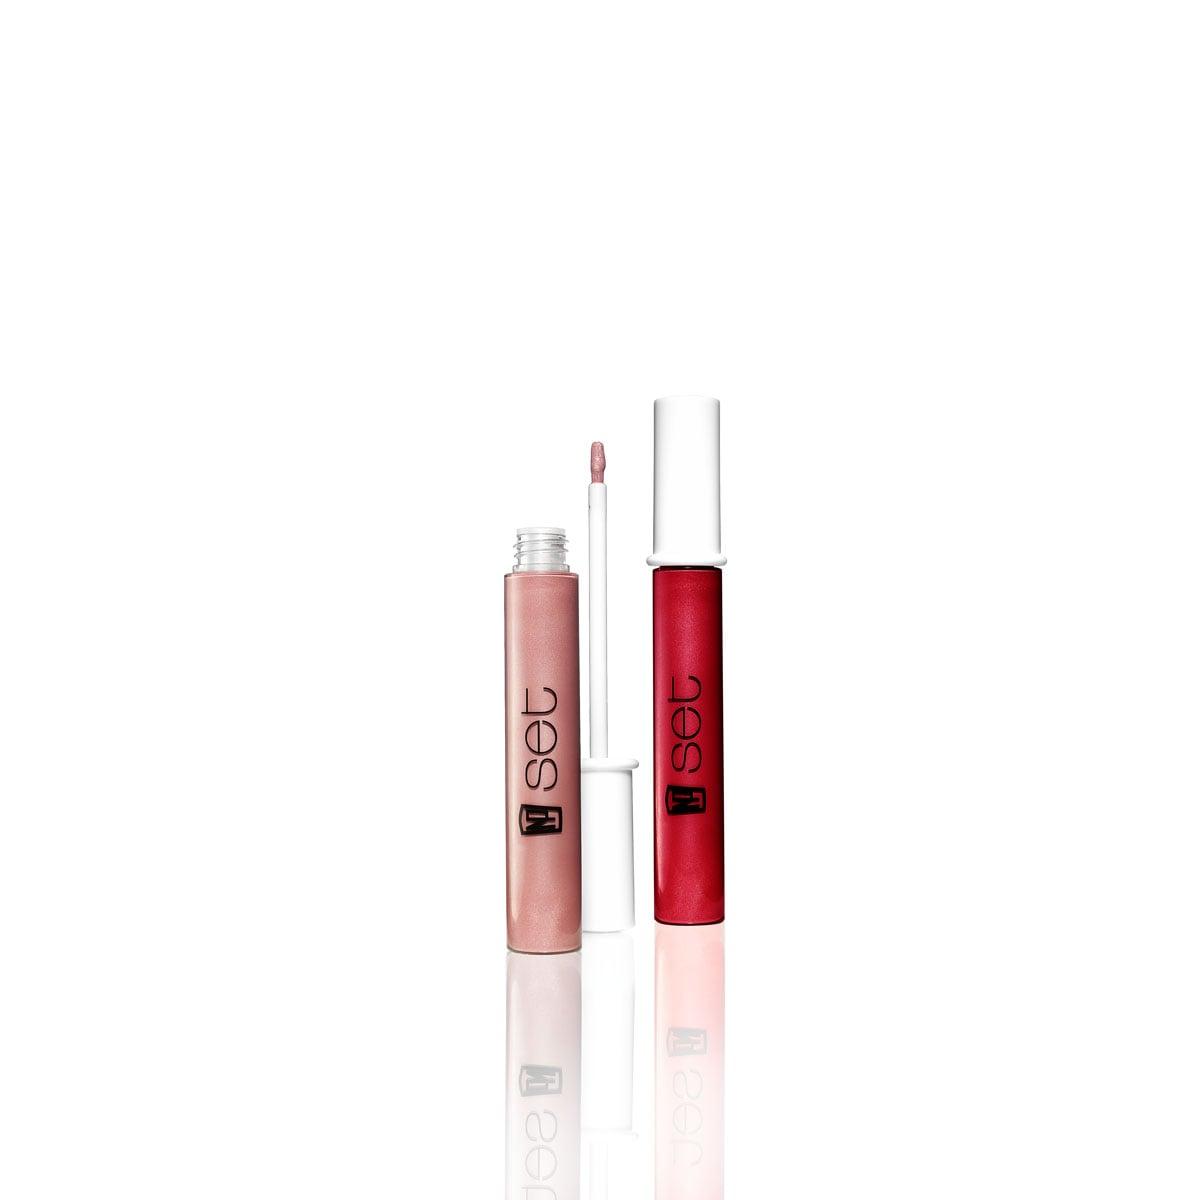 NP Set Lip Gloss ($15) — lots of shine.